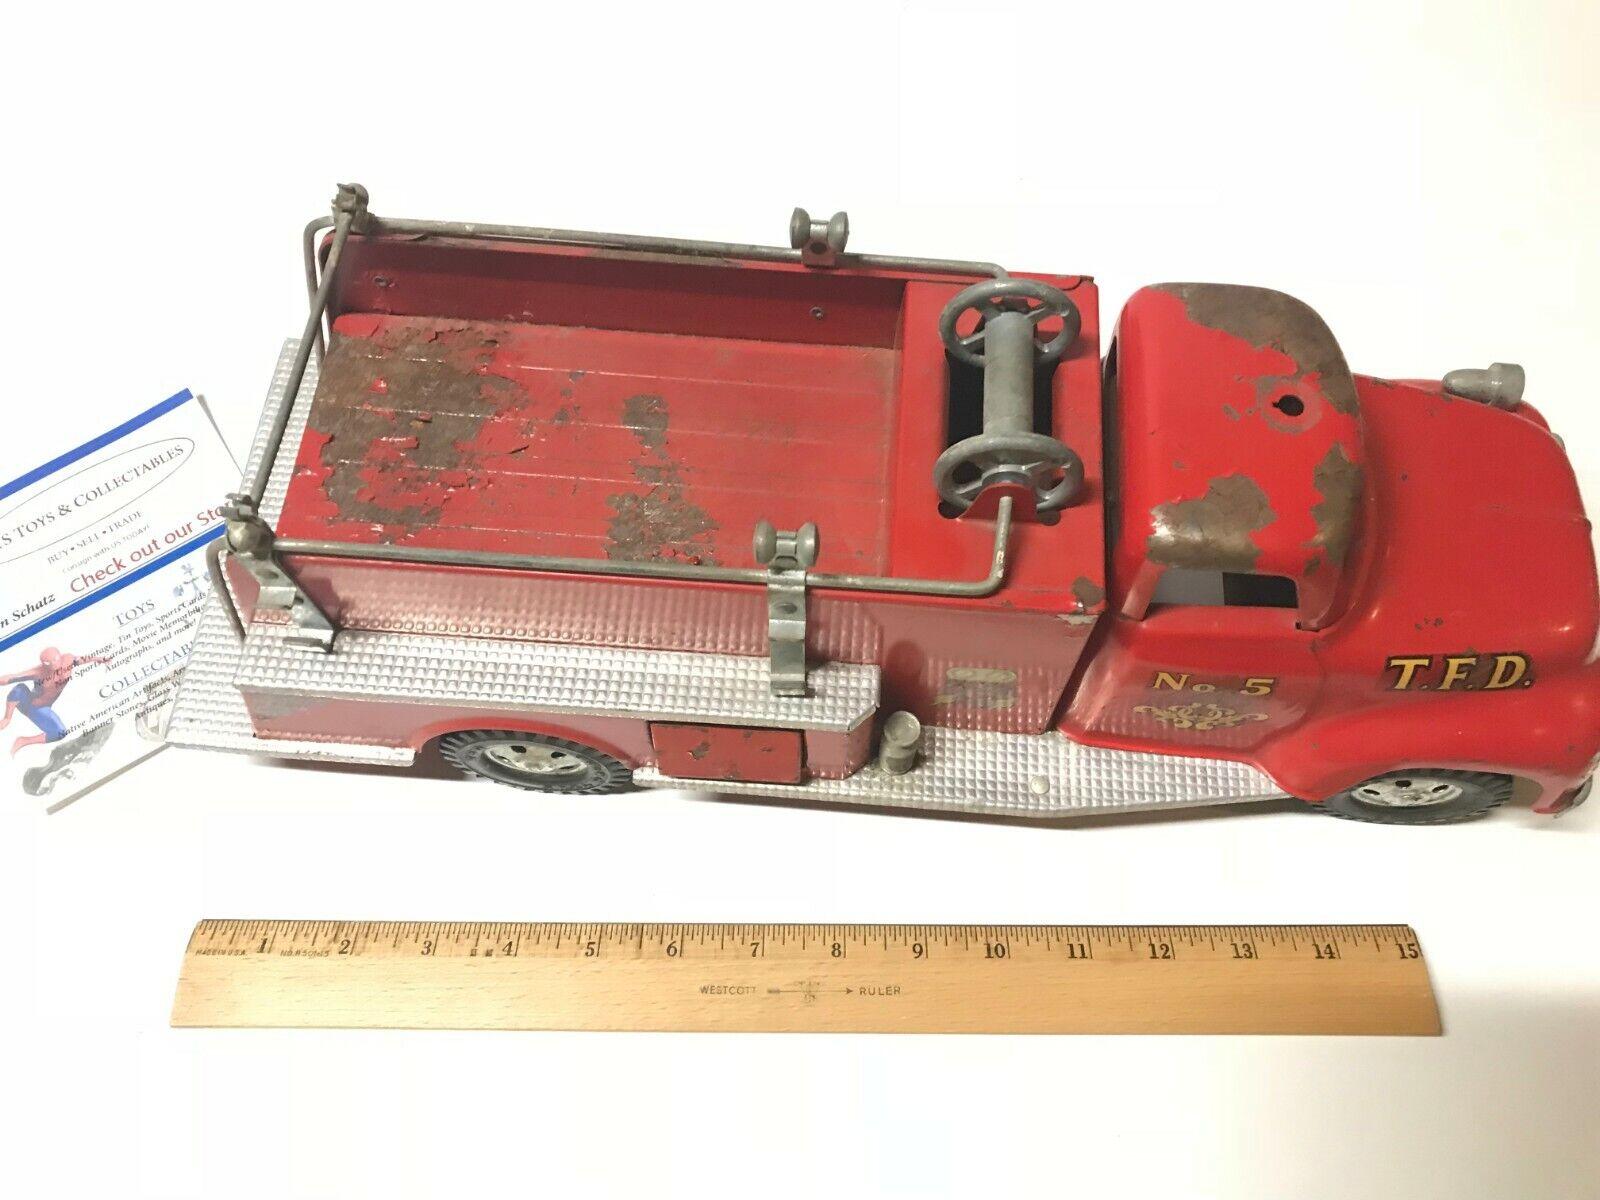 Vintage 1950's Tonka No. 5 Metal Toy Pumper Fire Truck Pressed Steel